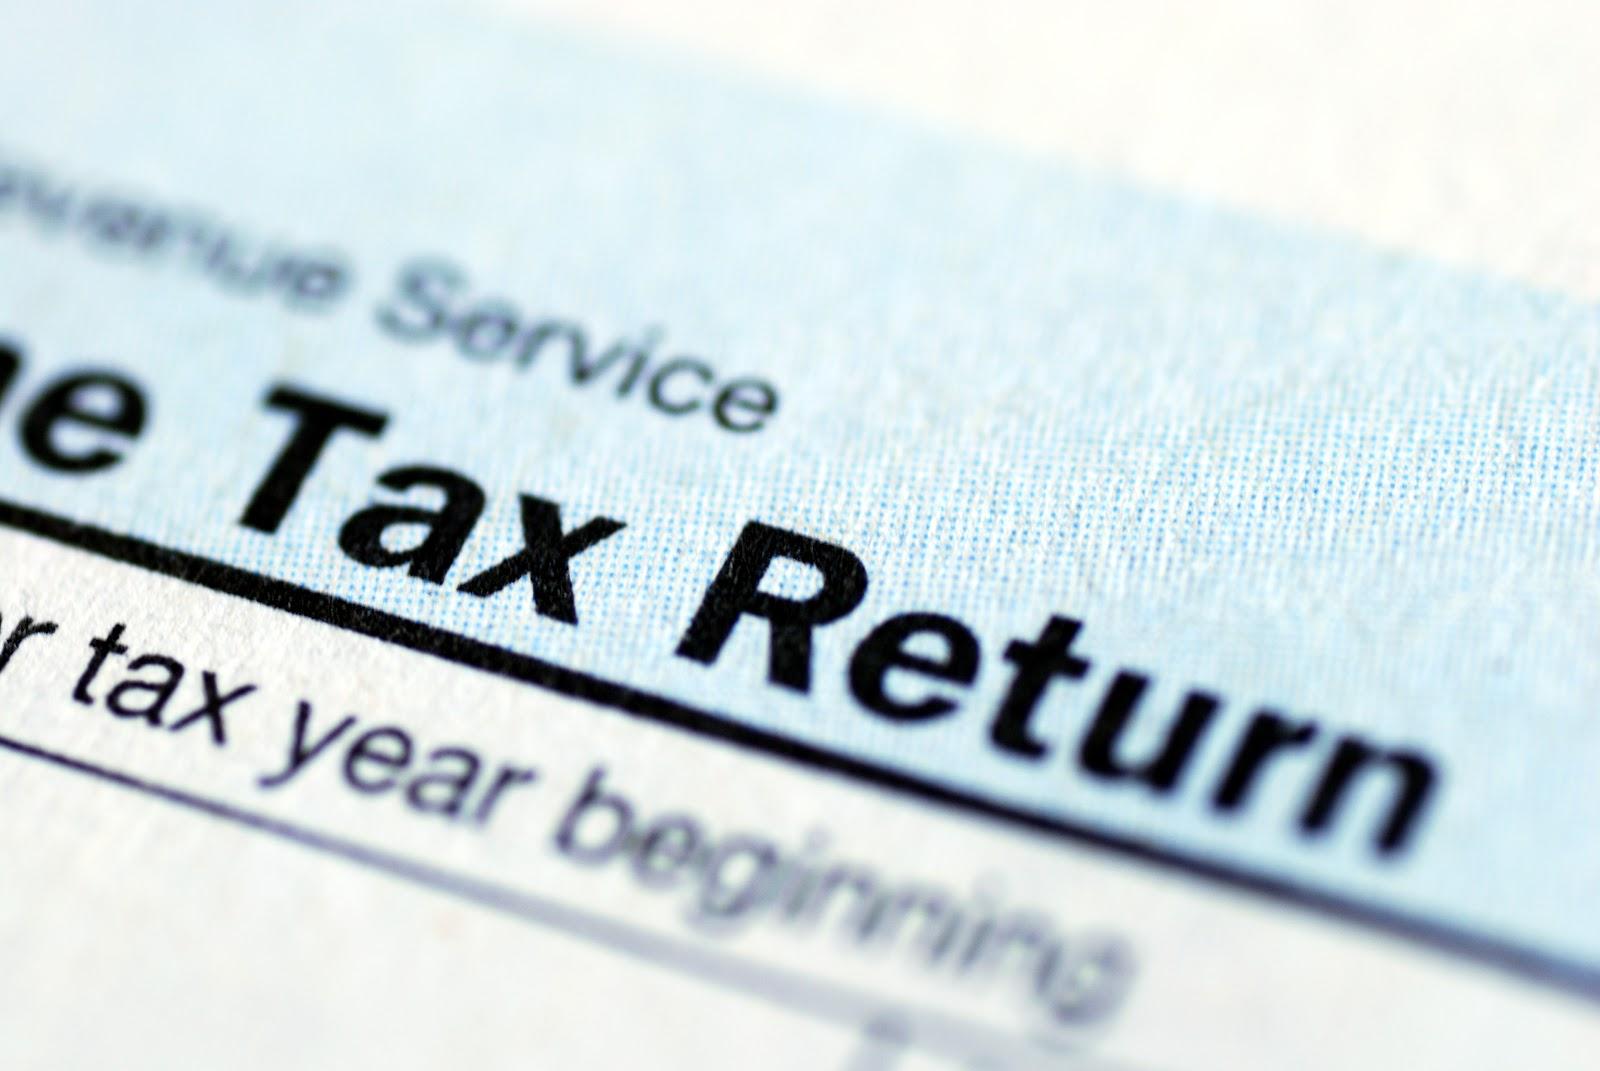 Closeup shot of a tax return